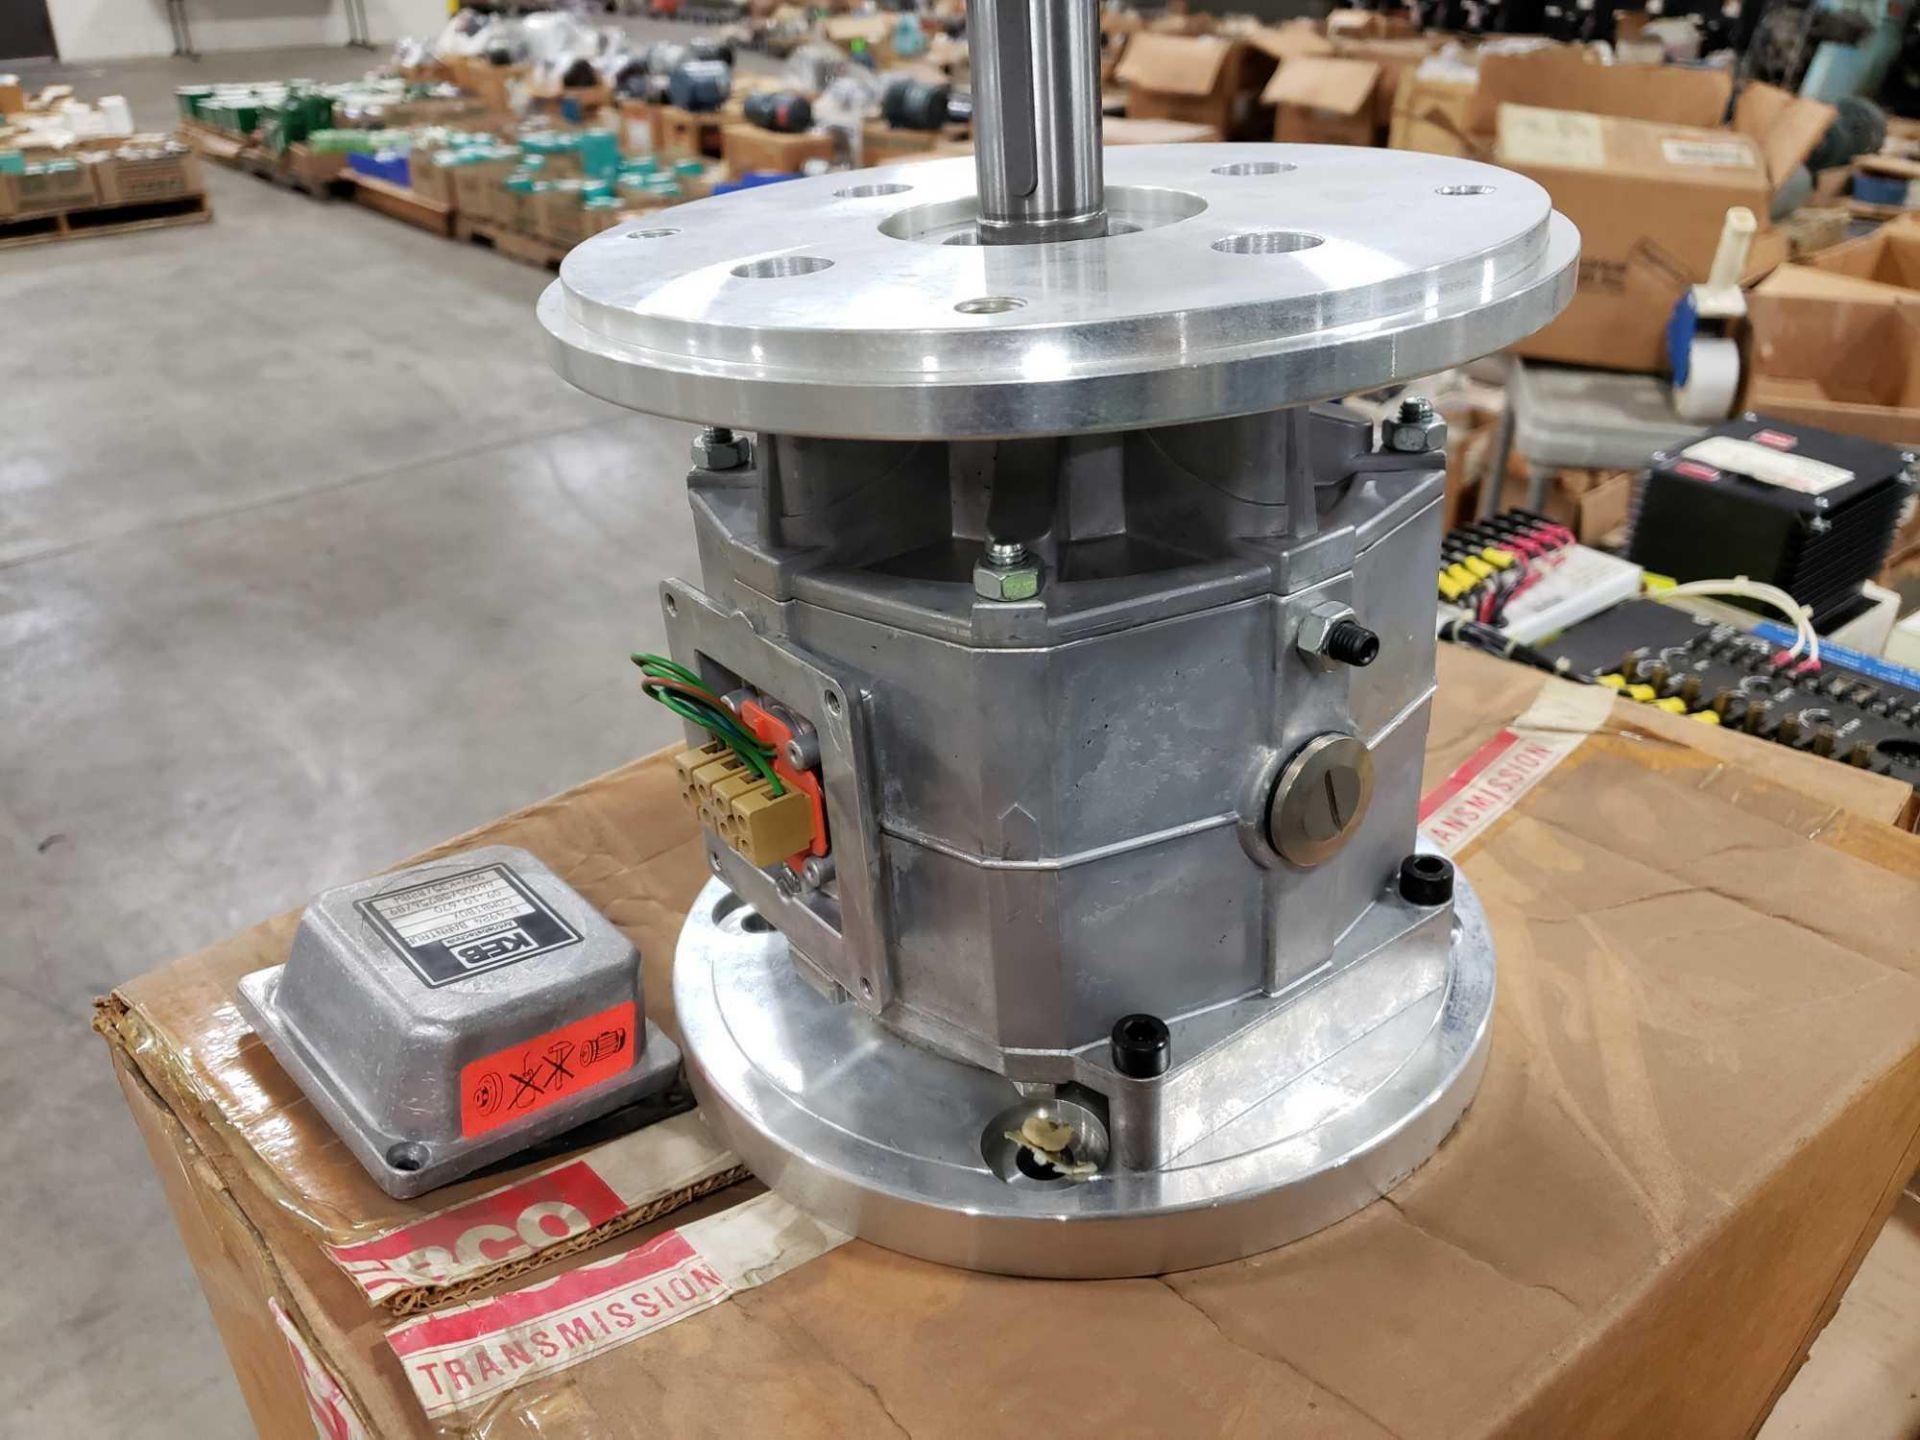 Lot 27 - KEB Combibox model 09.10-670. New in box.